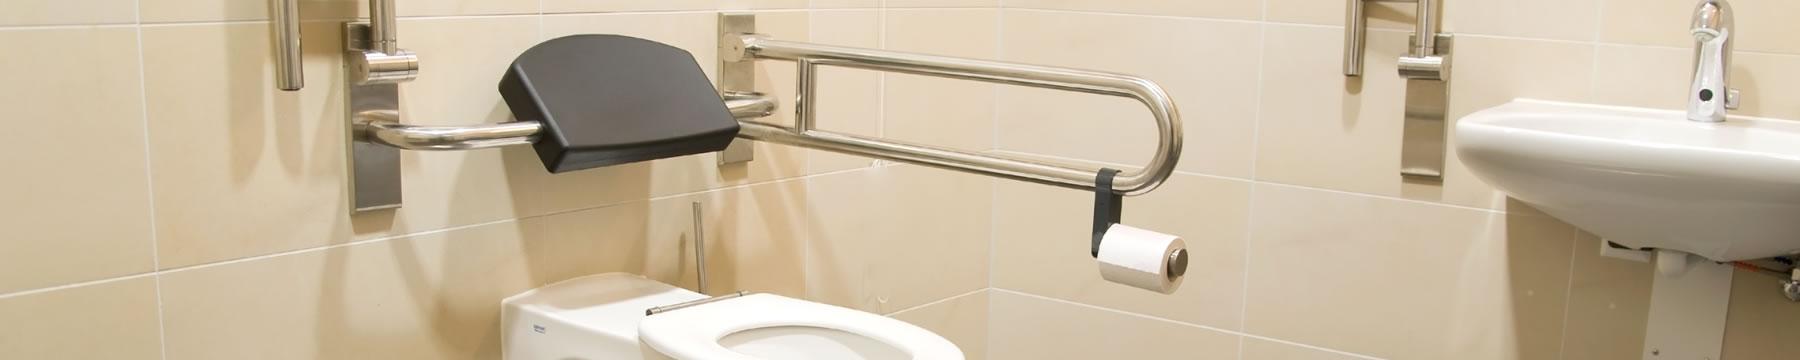 Disabled Adaptations - Bathroom